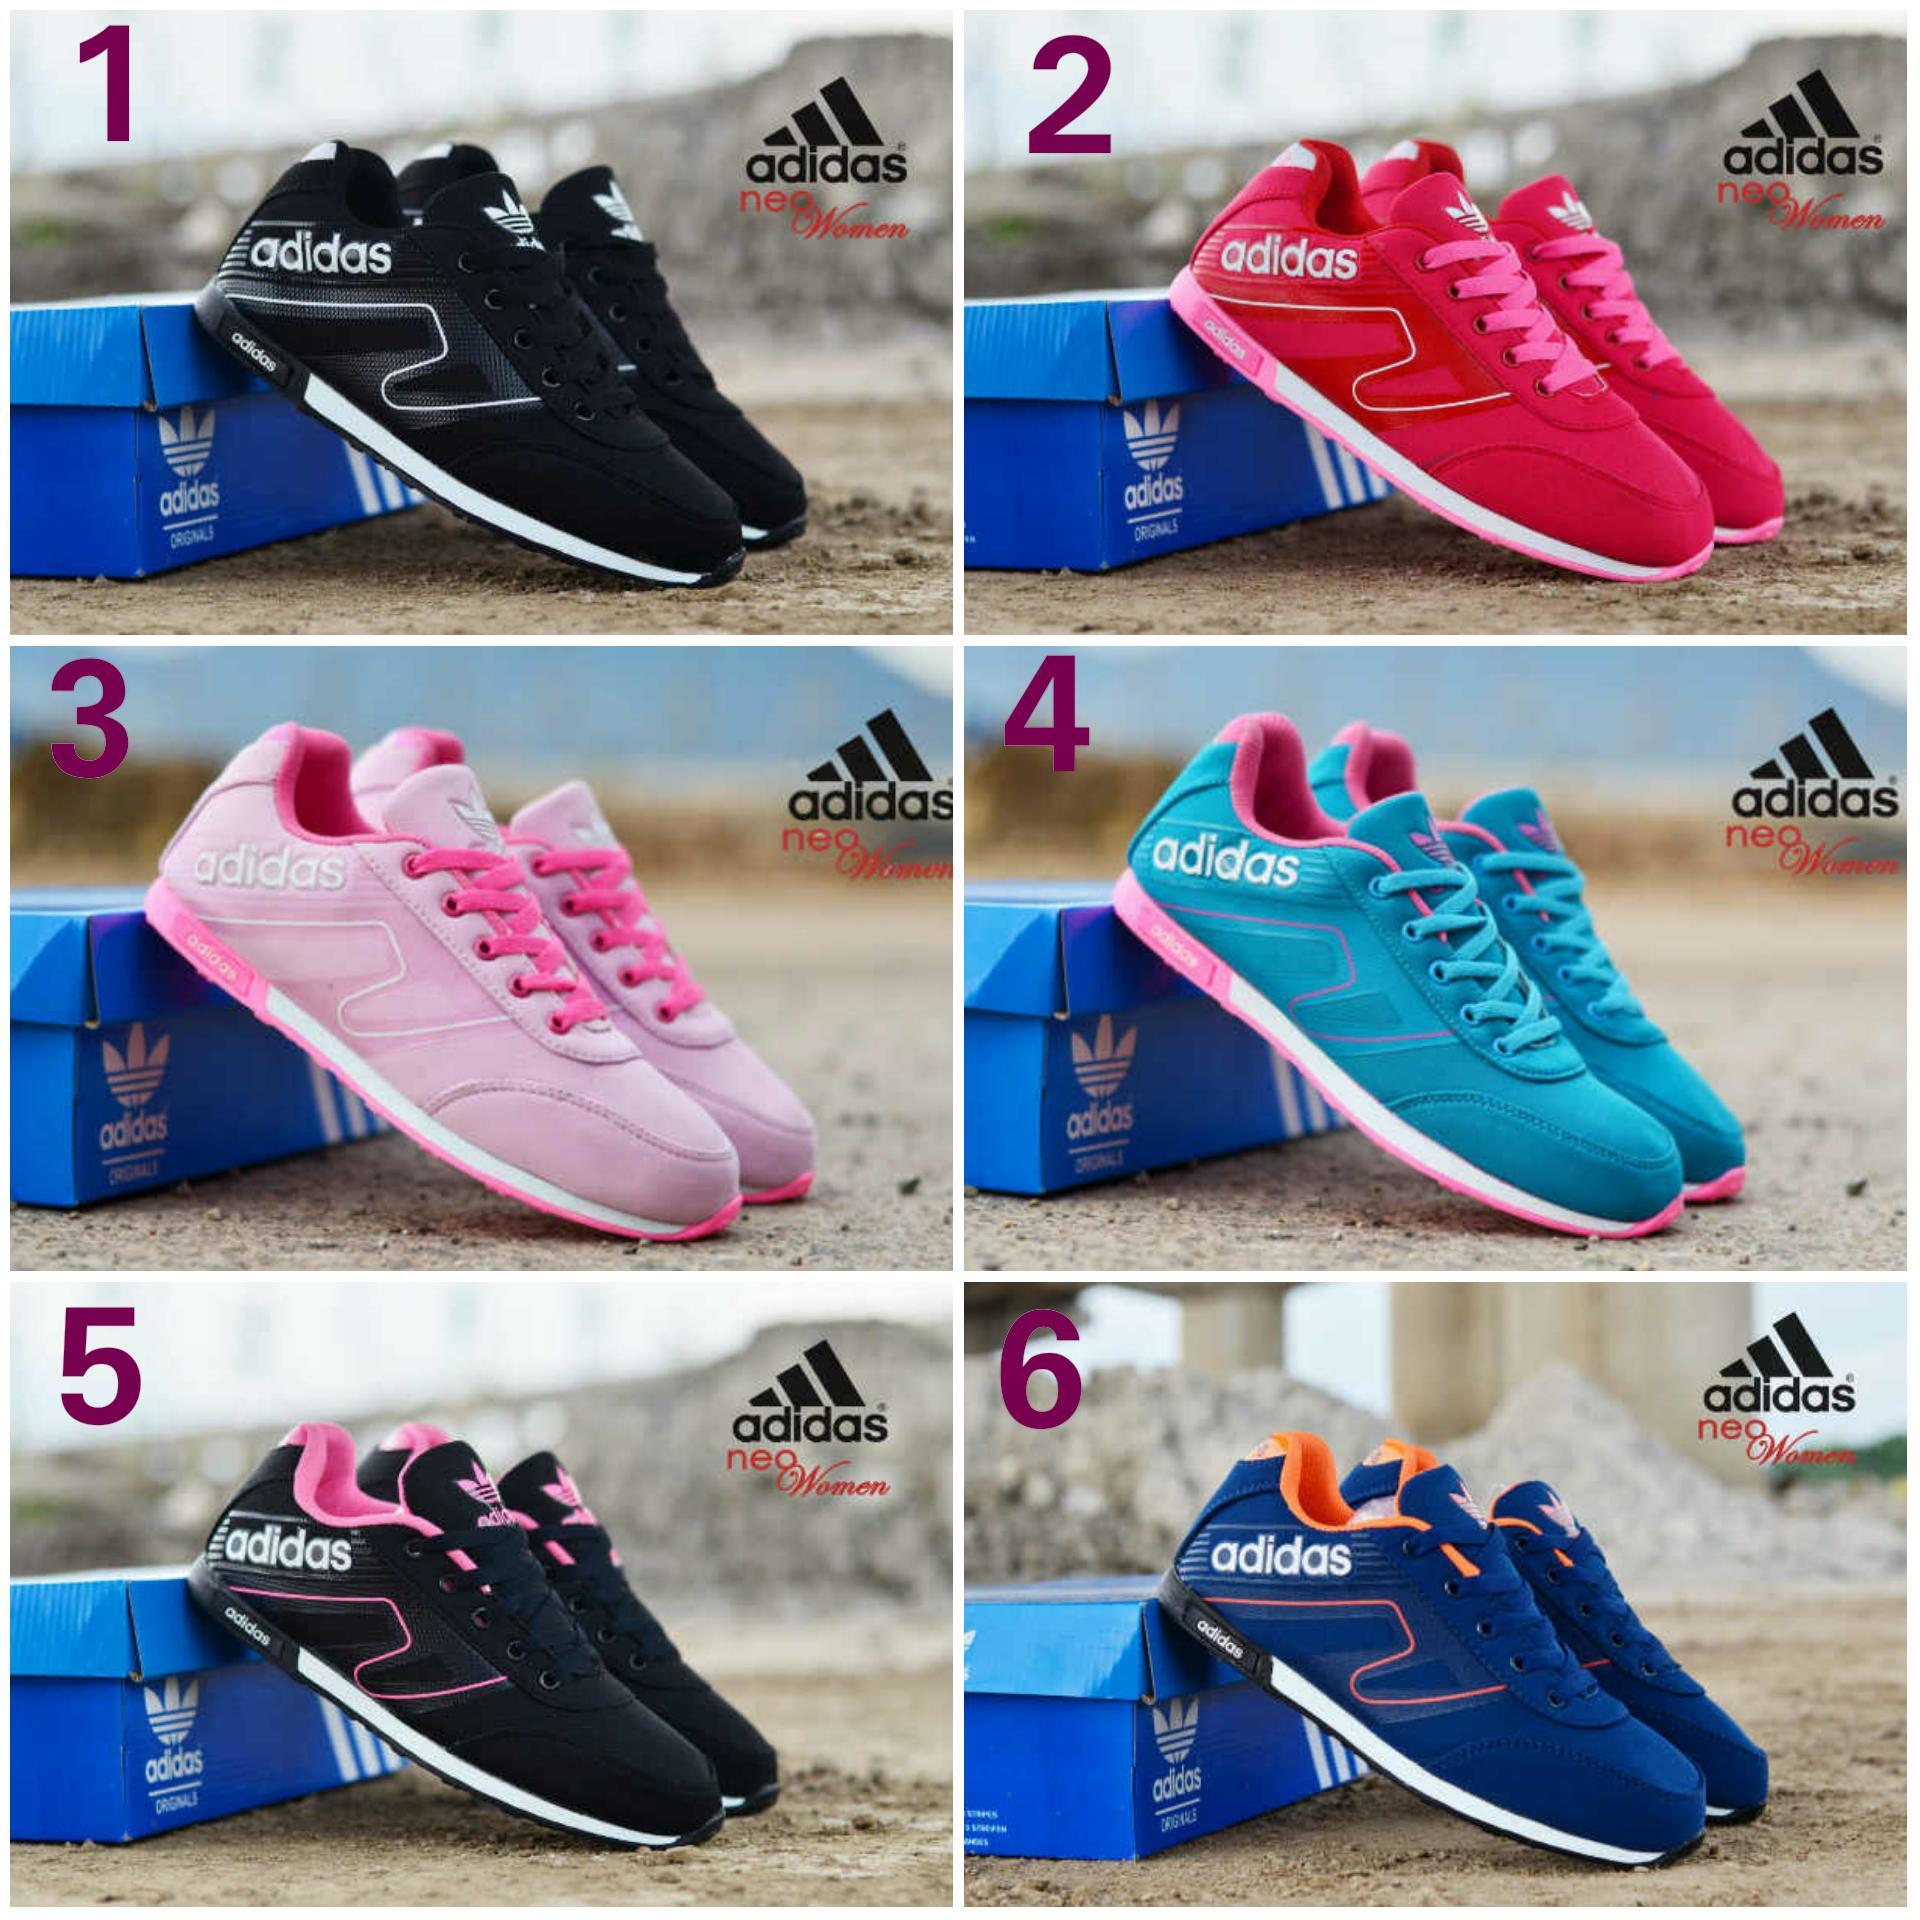 Promo sepatu adidas neo woman import casual sneakers made in vietnam Diskon